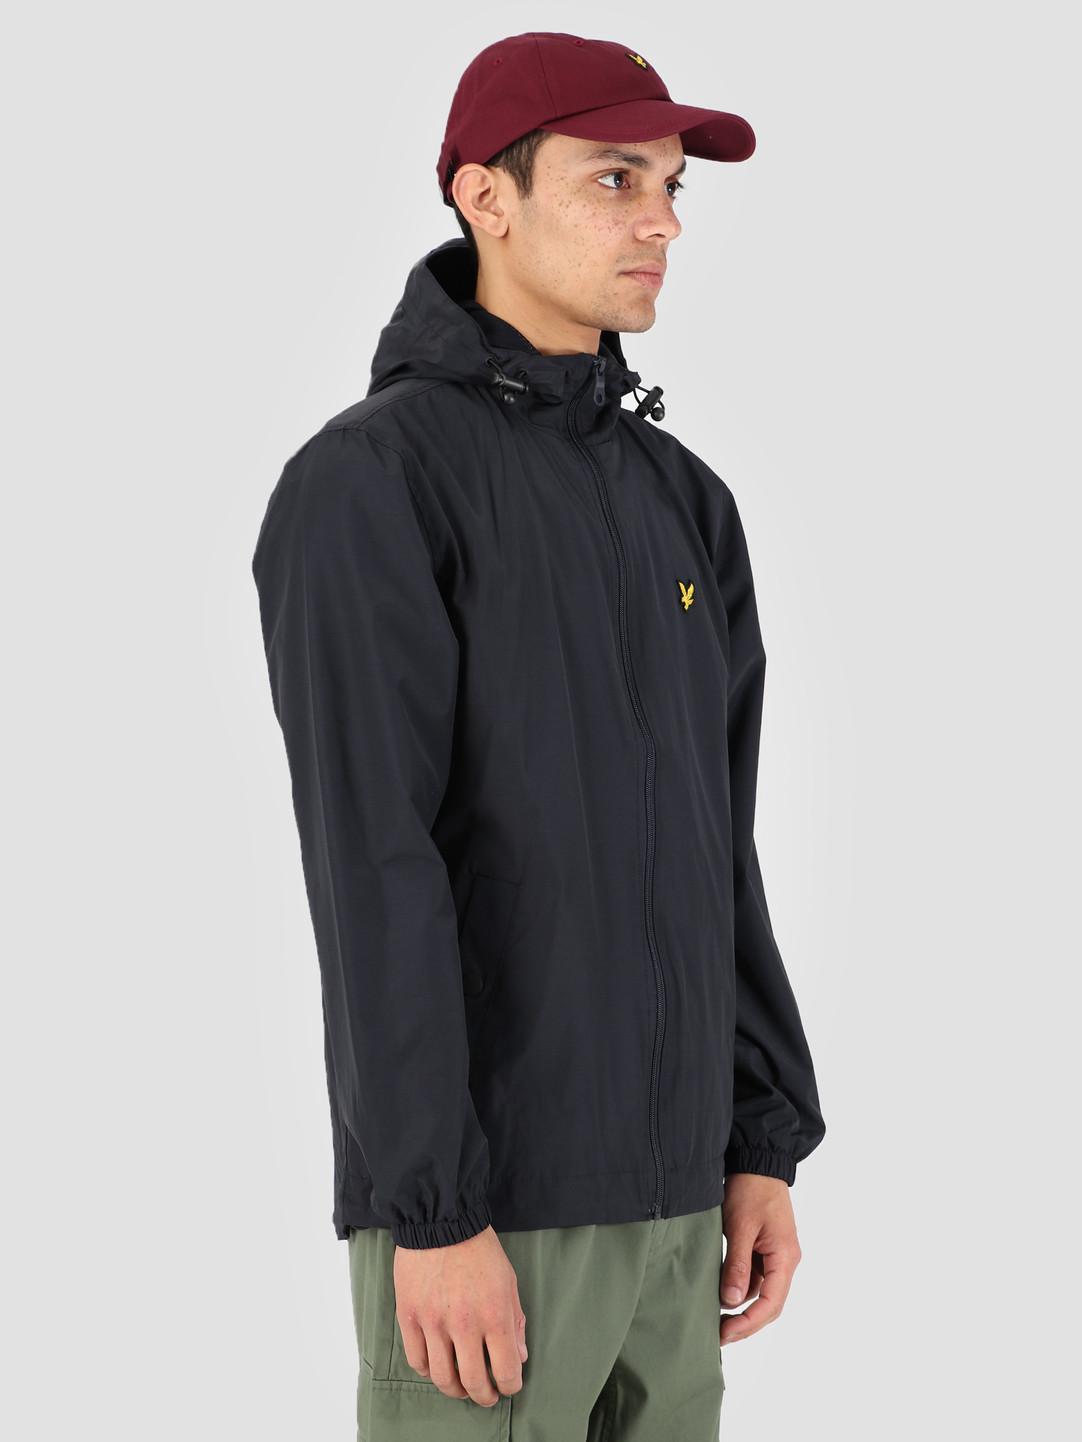 Lyle and Scott Lyle and Scott Zip Through Hooded Jacket Z271 Dark Navy JK464V